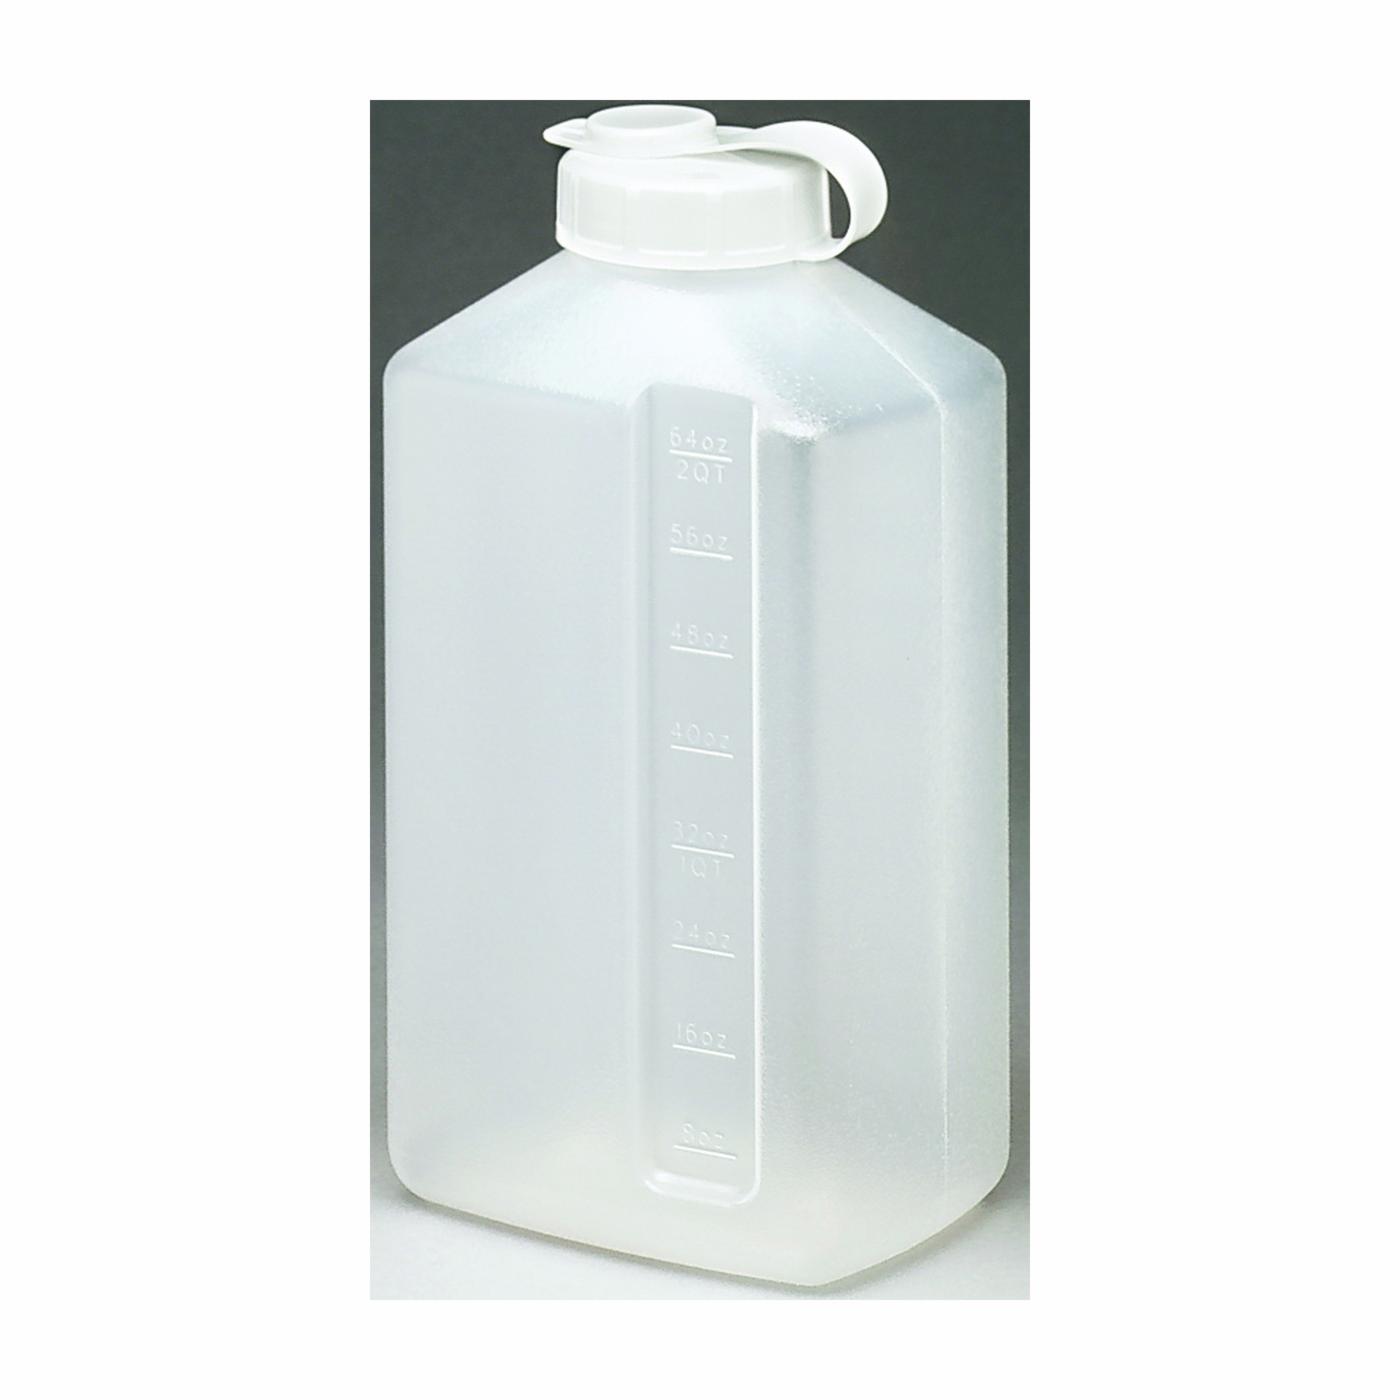 ARROW PLASTICS MFG 15205